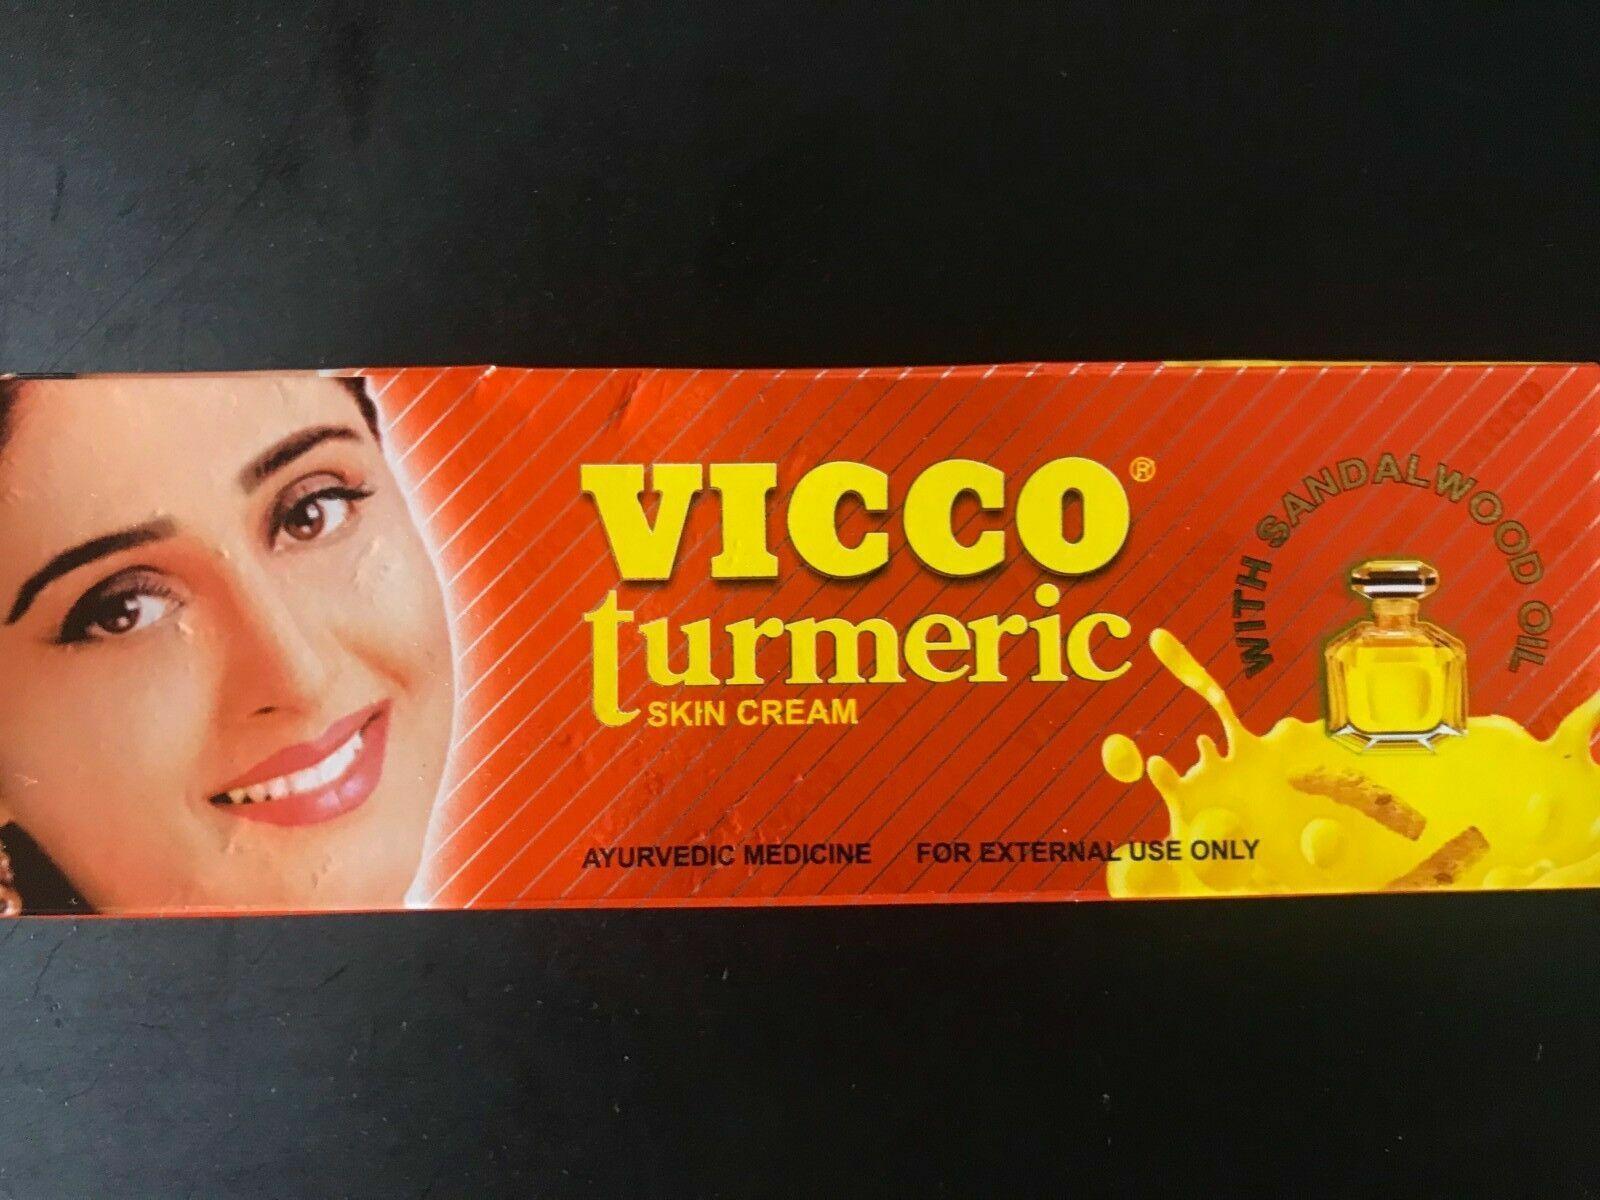 Vicco Turmeric Cream (Ayurvedische Haut-Creme mit Sandelholzöl) 70g Neu Verpackt